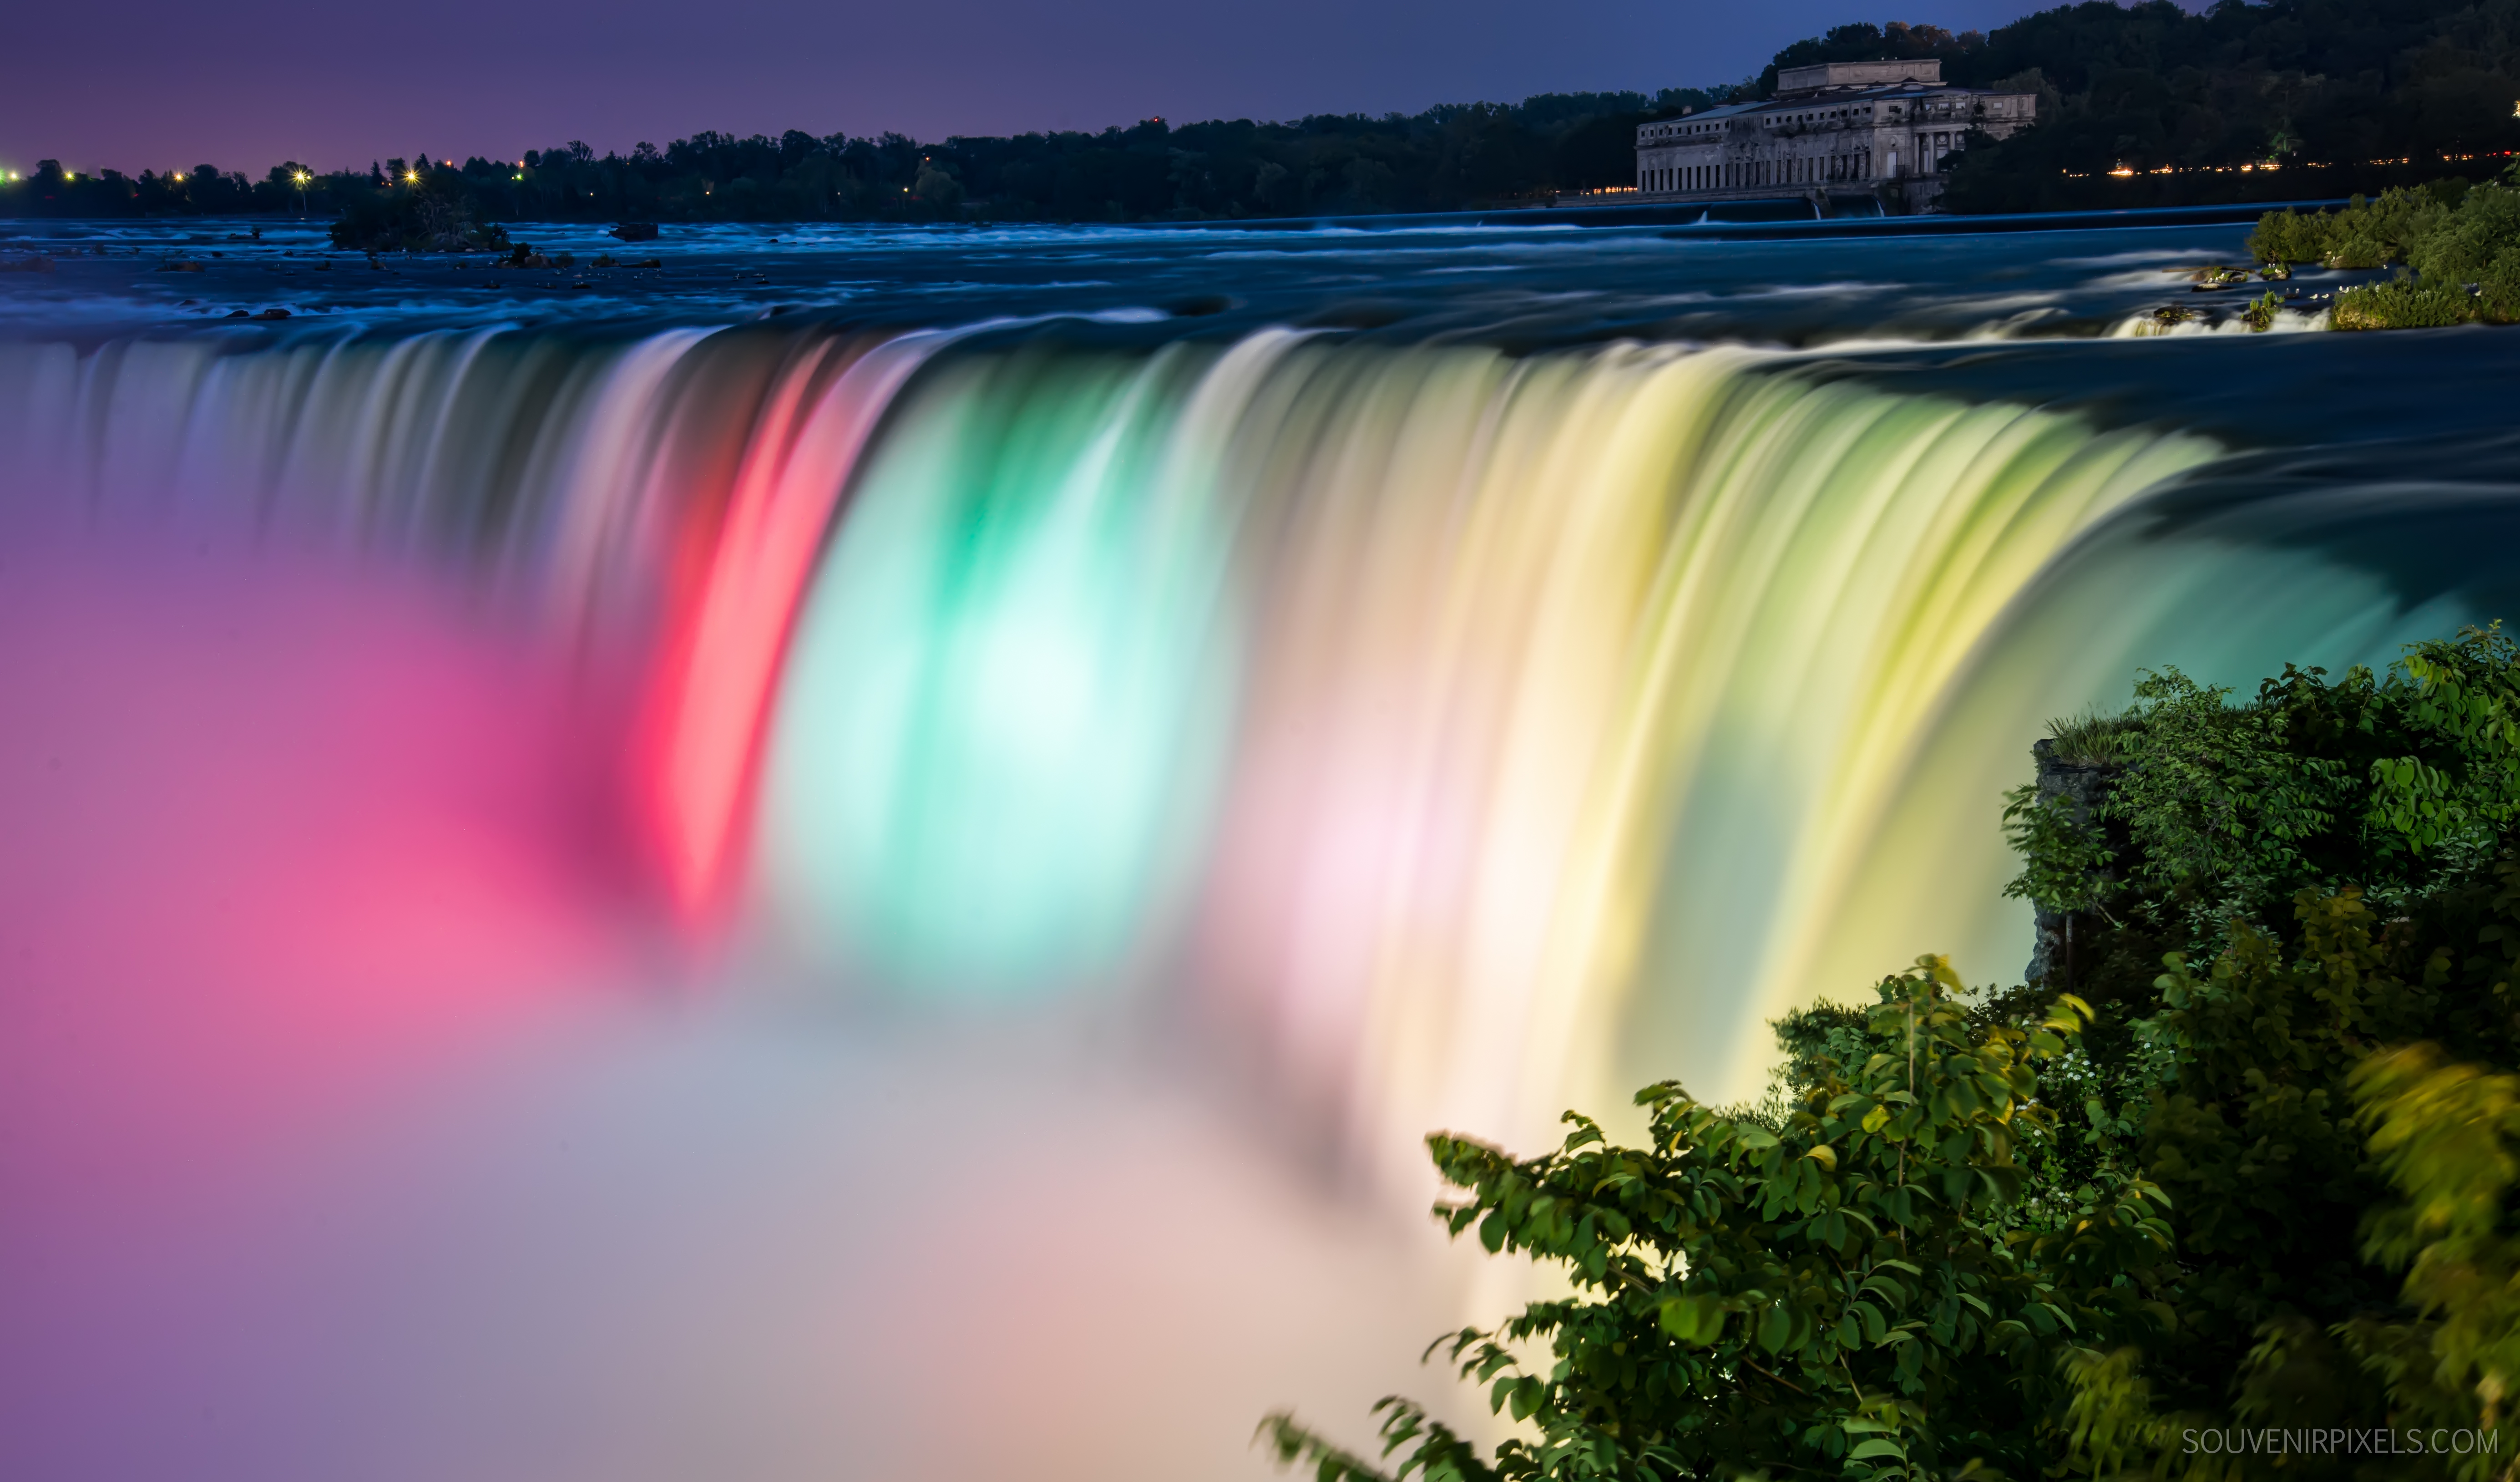 Wallpaper Niagara Falls, Colorful, Vibrant, Canada, 5K, World, #9256